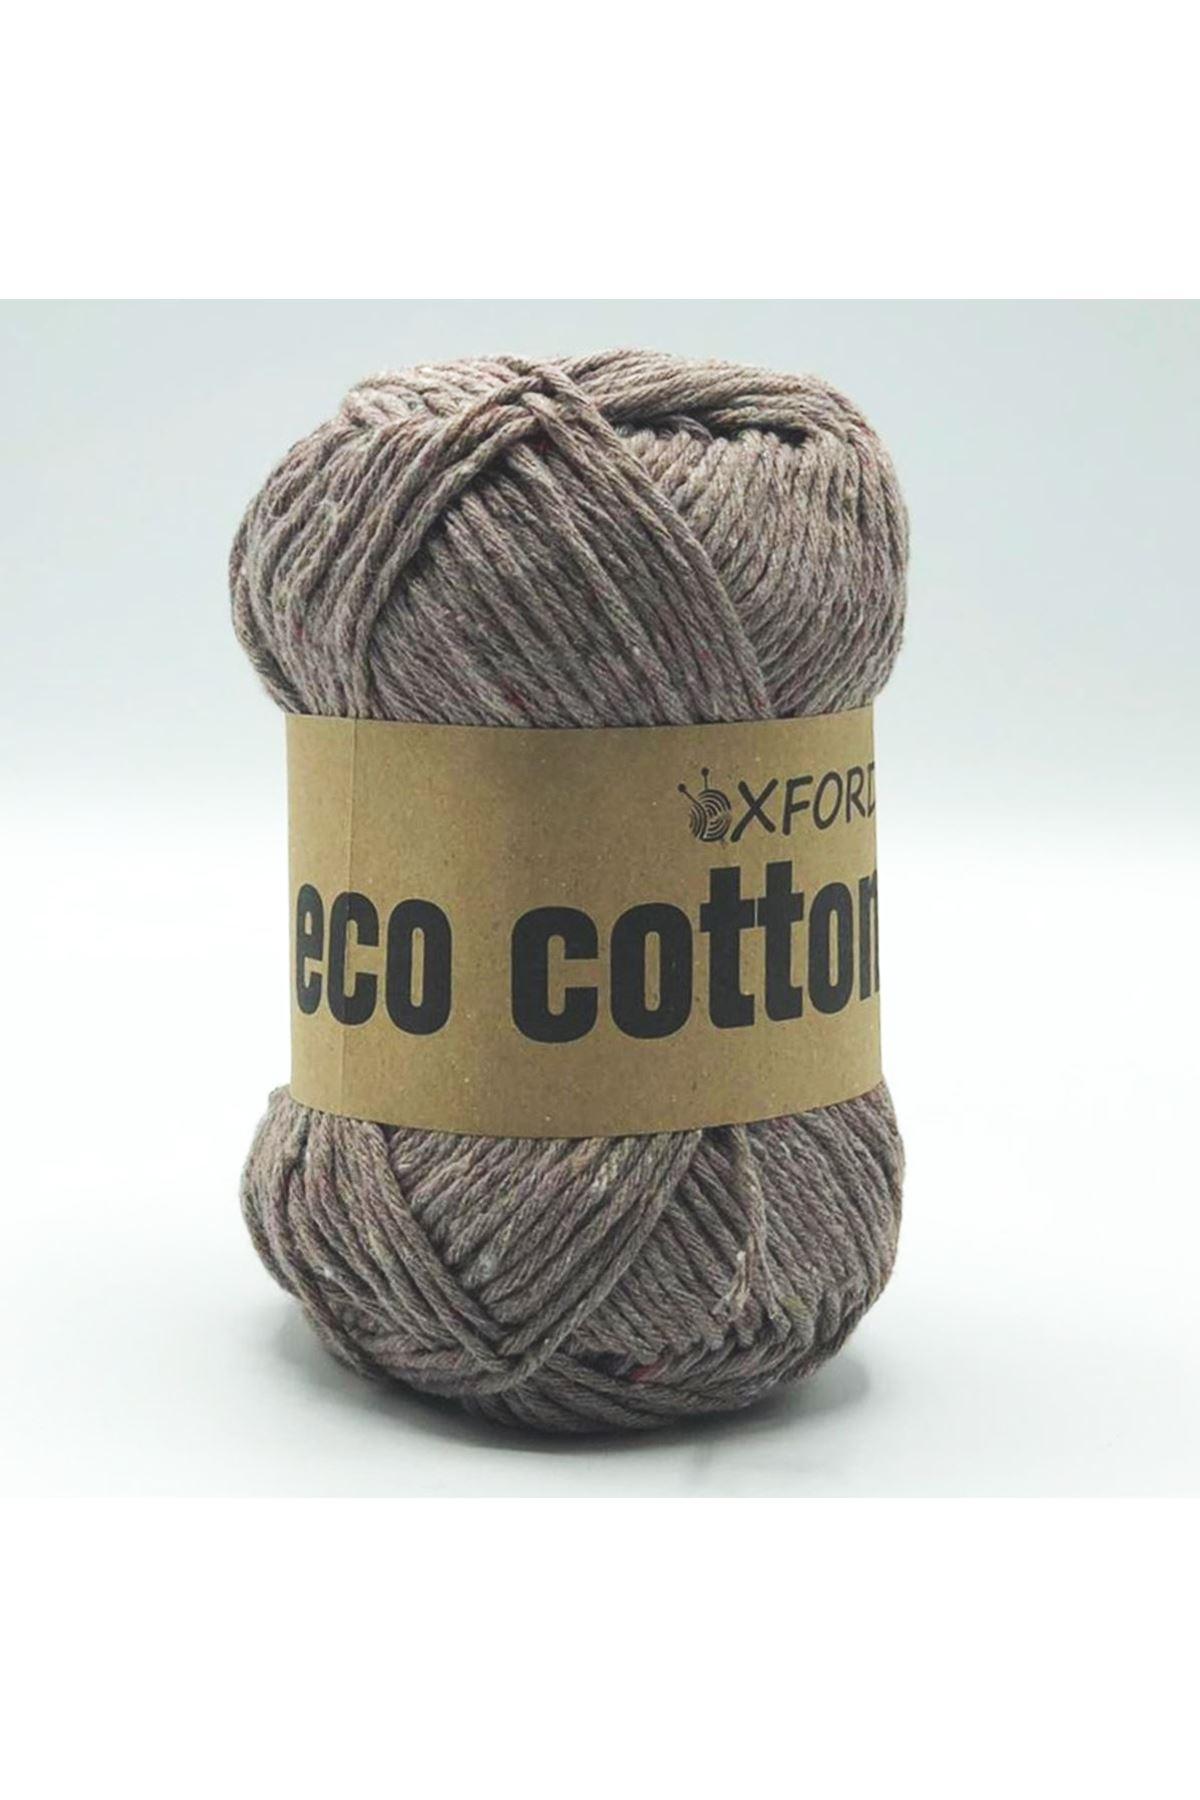 Eco Cotton 100 gram - 00128 - Sütlükahve